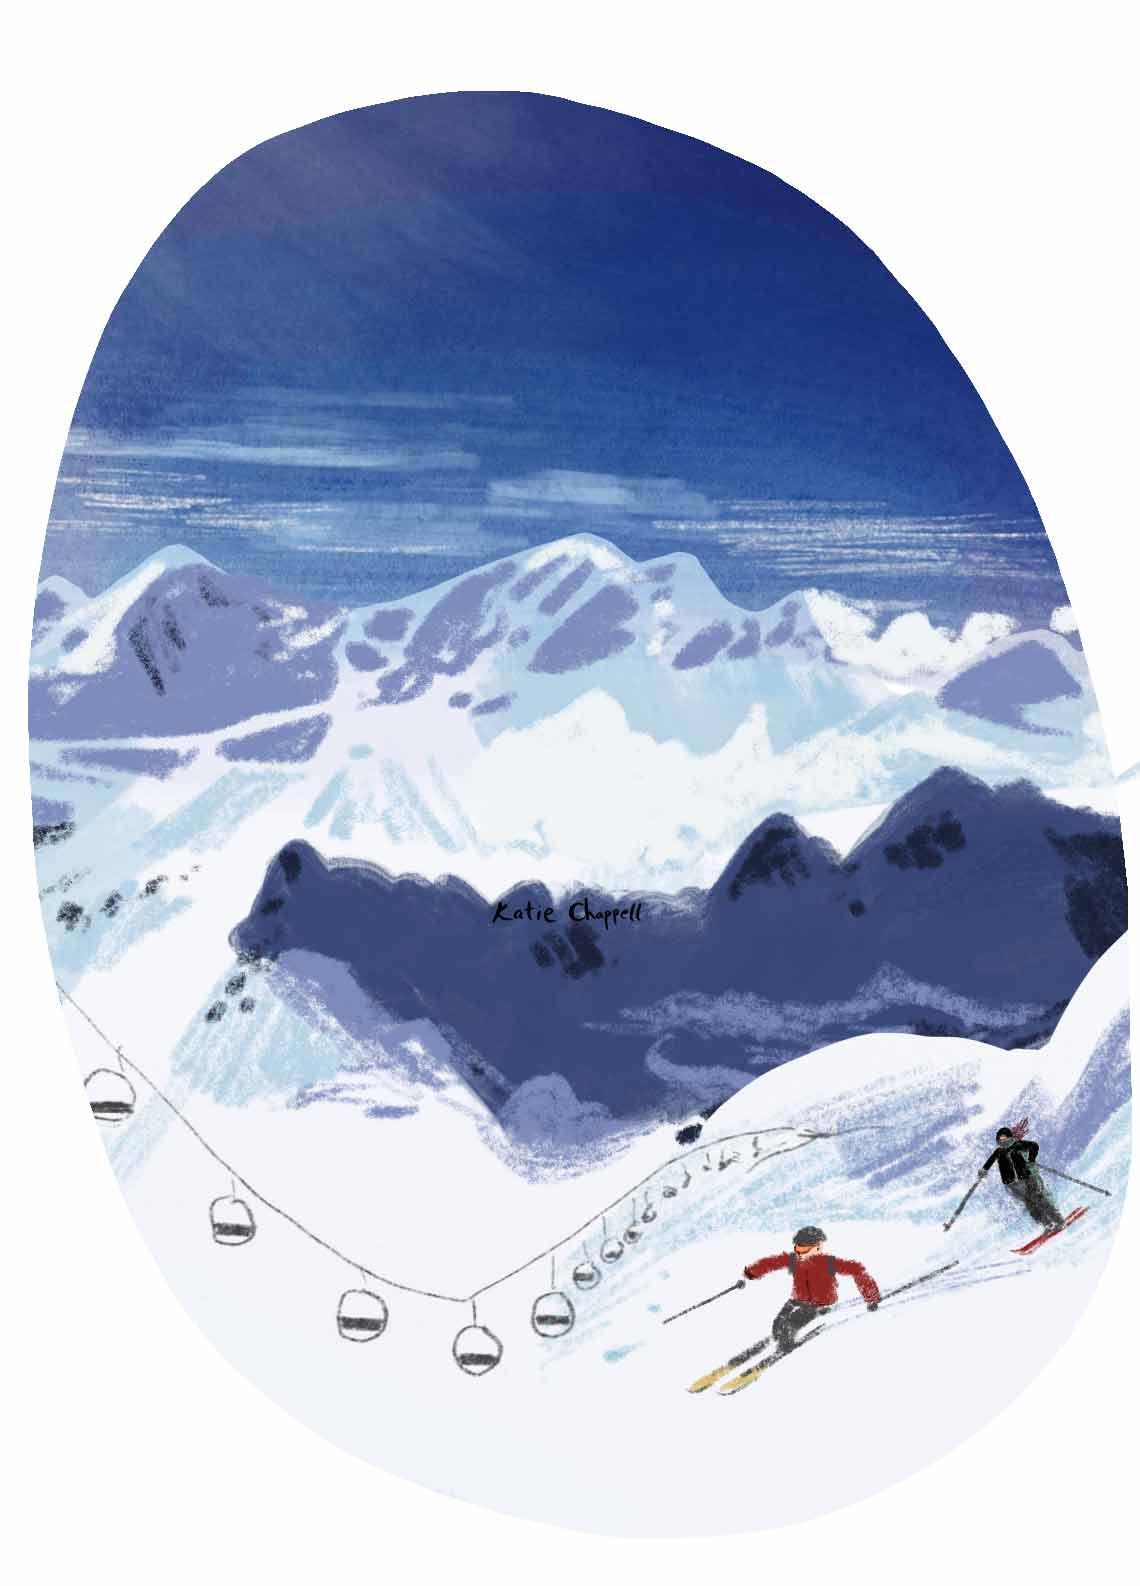 Skiing-illustration-edinburgh-katie-chappell.jpg